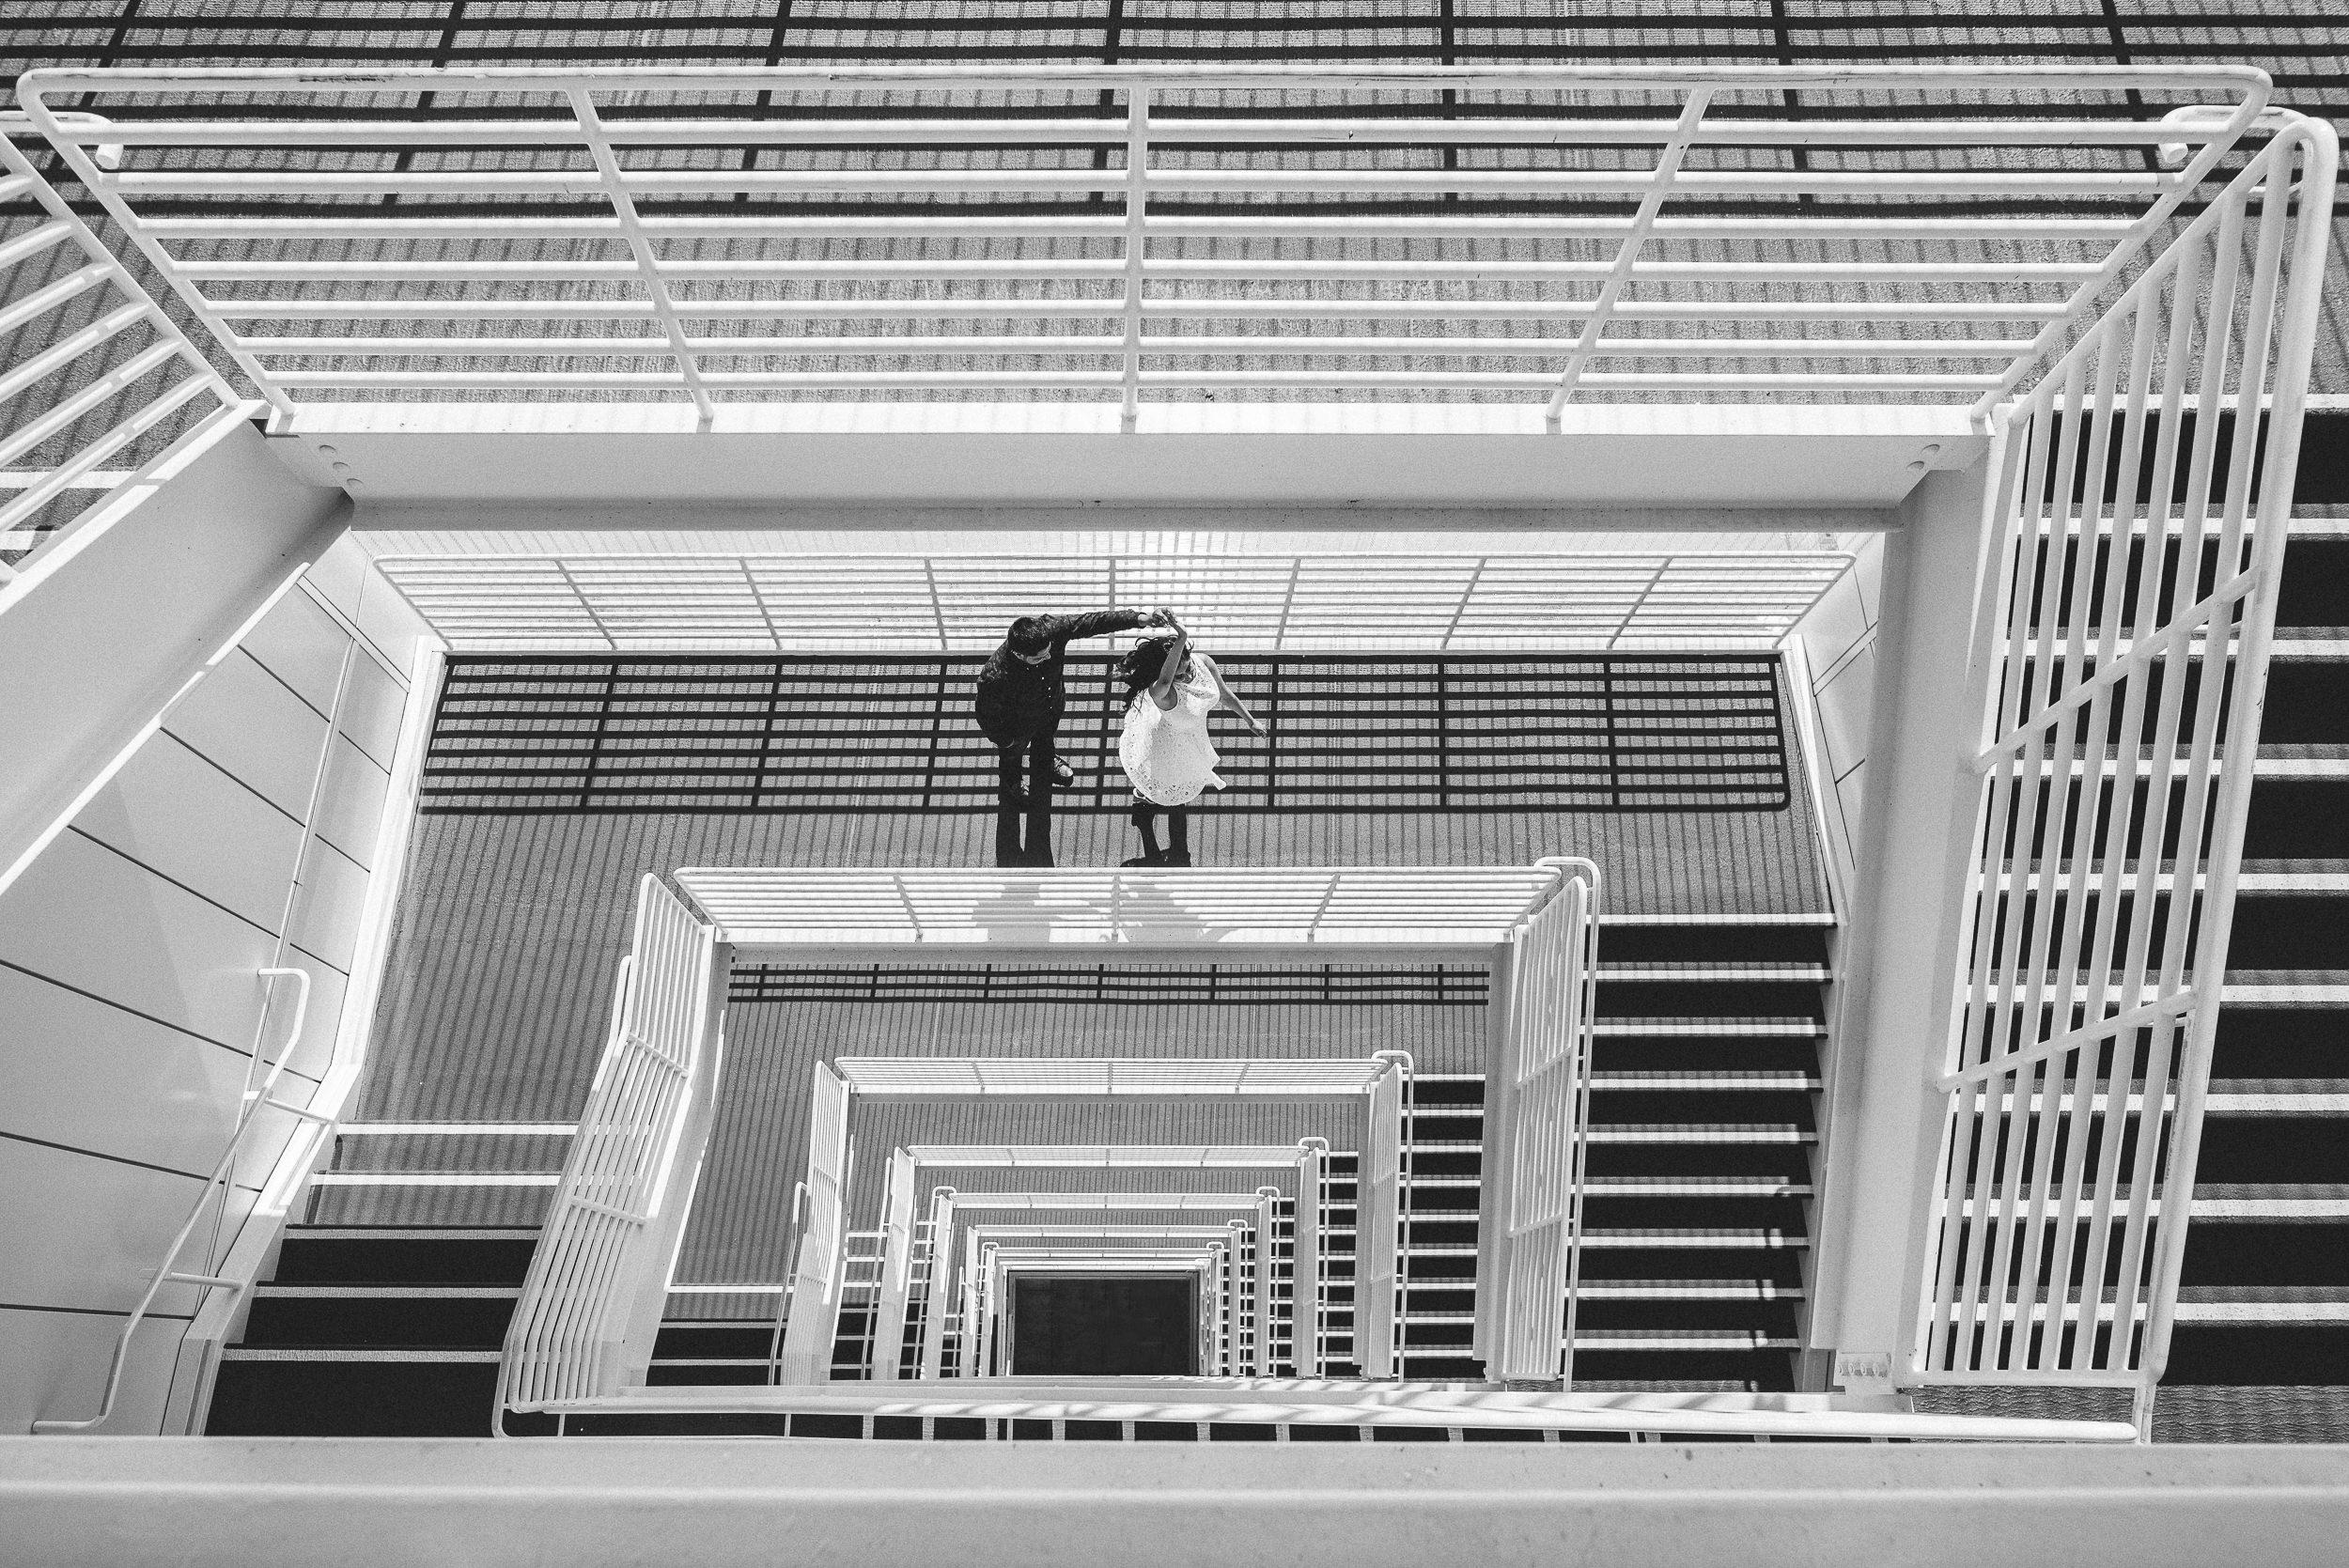 San-Francisco-49ers-Levis-Stadium-Engagement-Photography-013.jpg